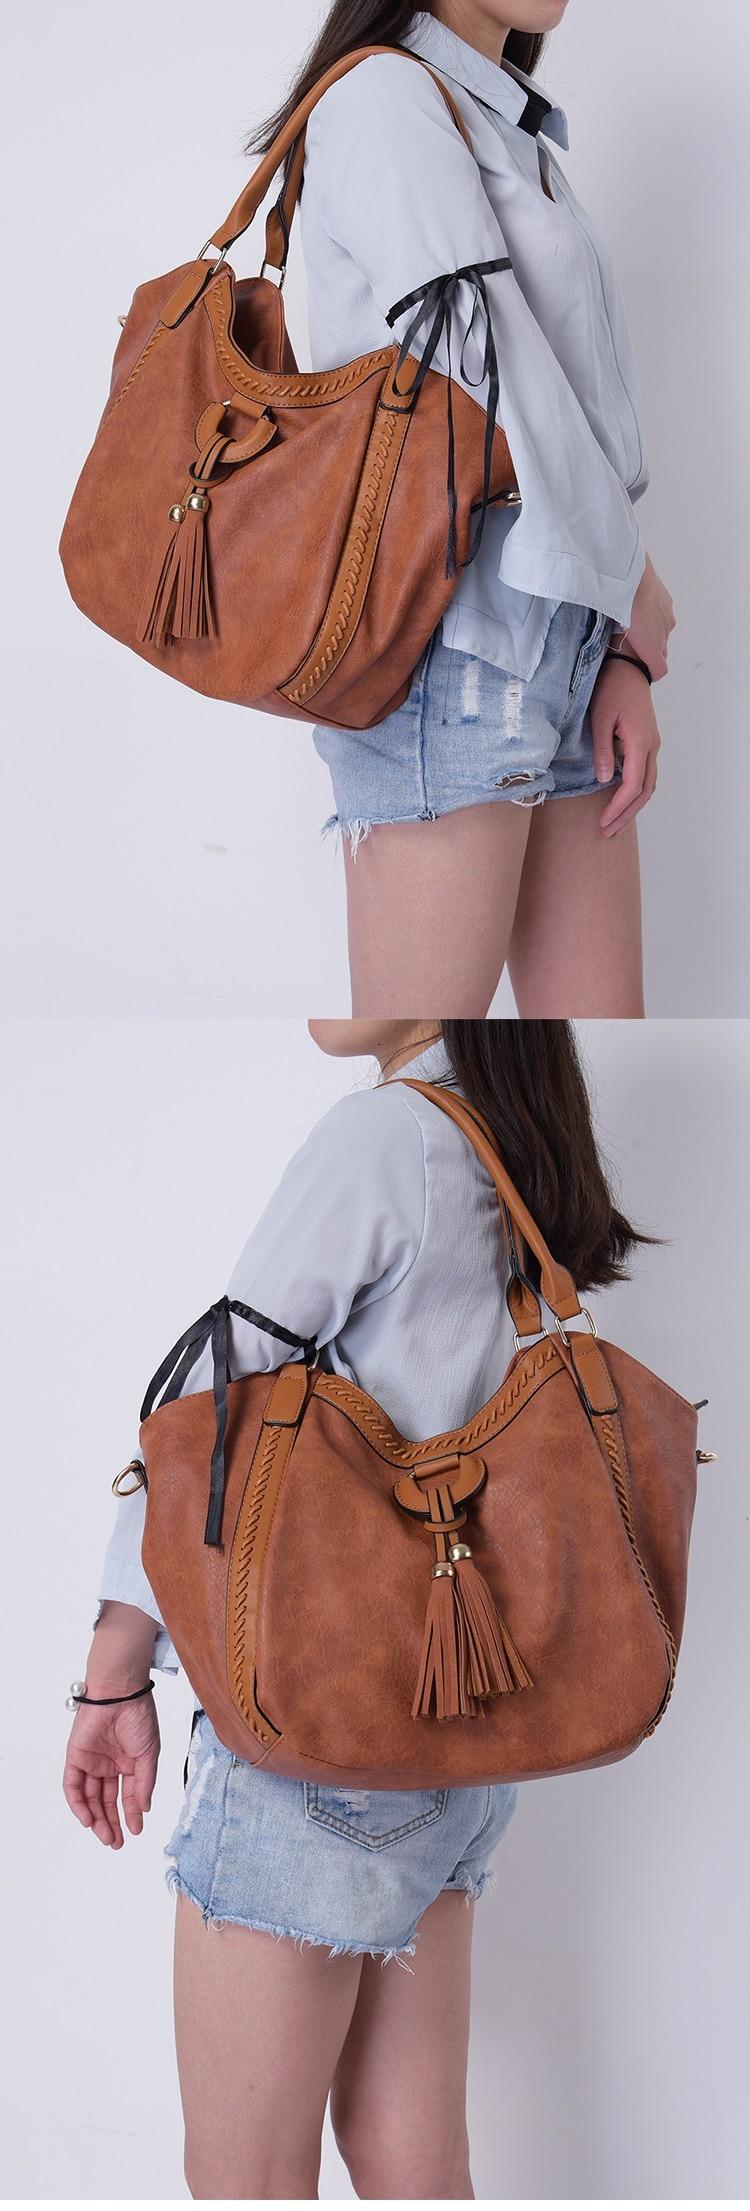 NIGEDU Leather Casual Tassel Handbag Large Famous Brands Designers Pu Leather Handbags Women Big Tote Bags Female Messenger Bags Bolsos Blue (8)